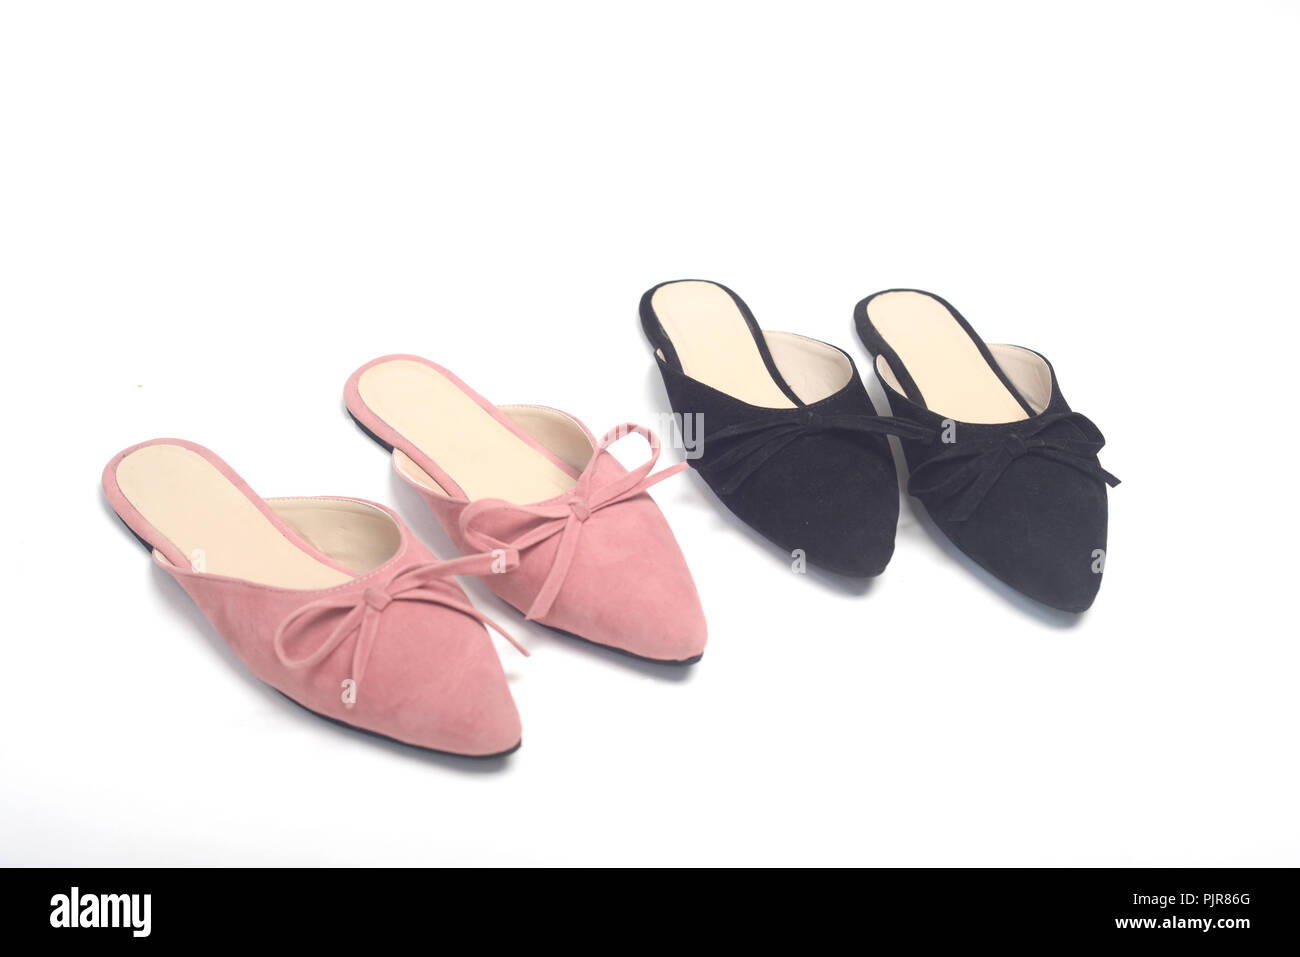 Girl shoes on white background - Stock Image